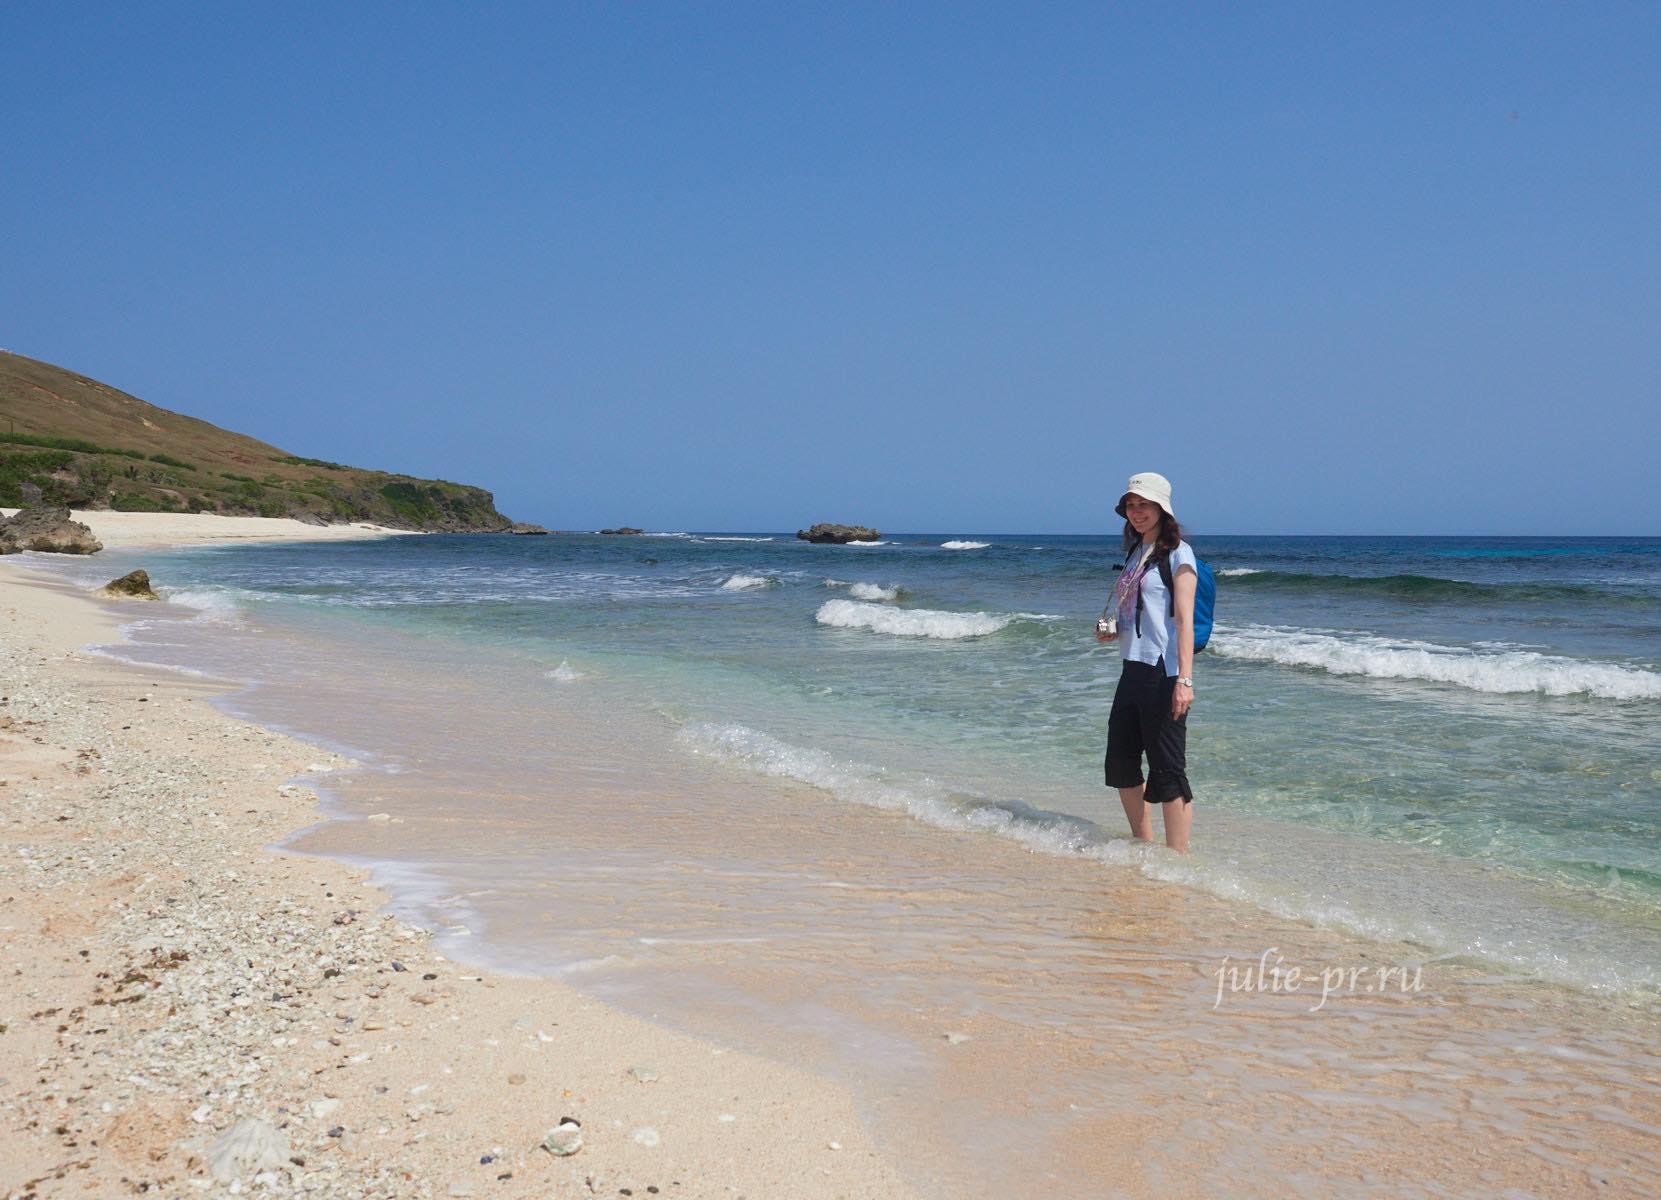 Филиппины, острова Батанес, Morong beach, Nakabuang